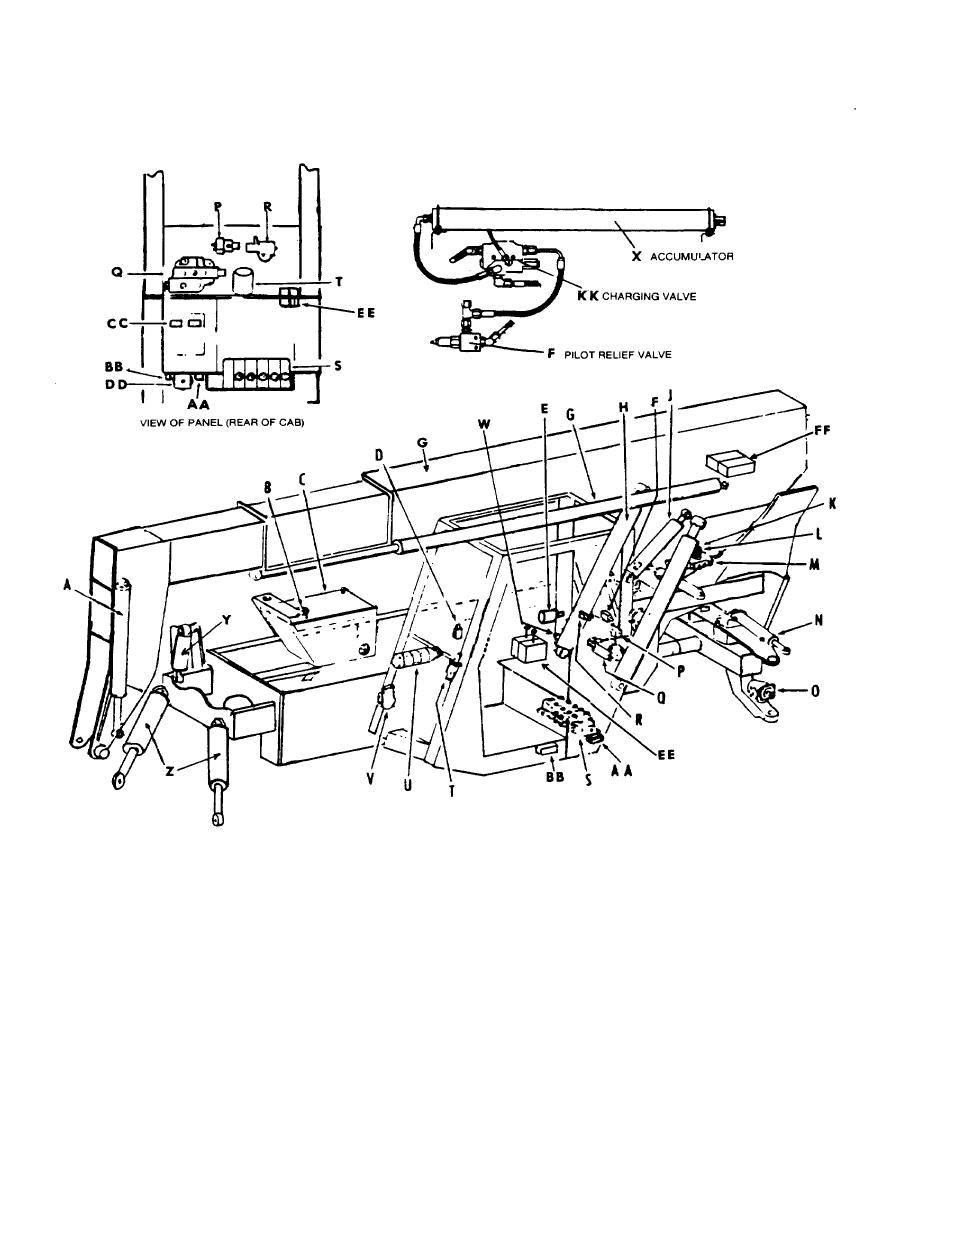 Hydraulic system nomenclature | Gradall 534B (9103-1390